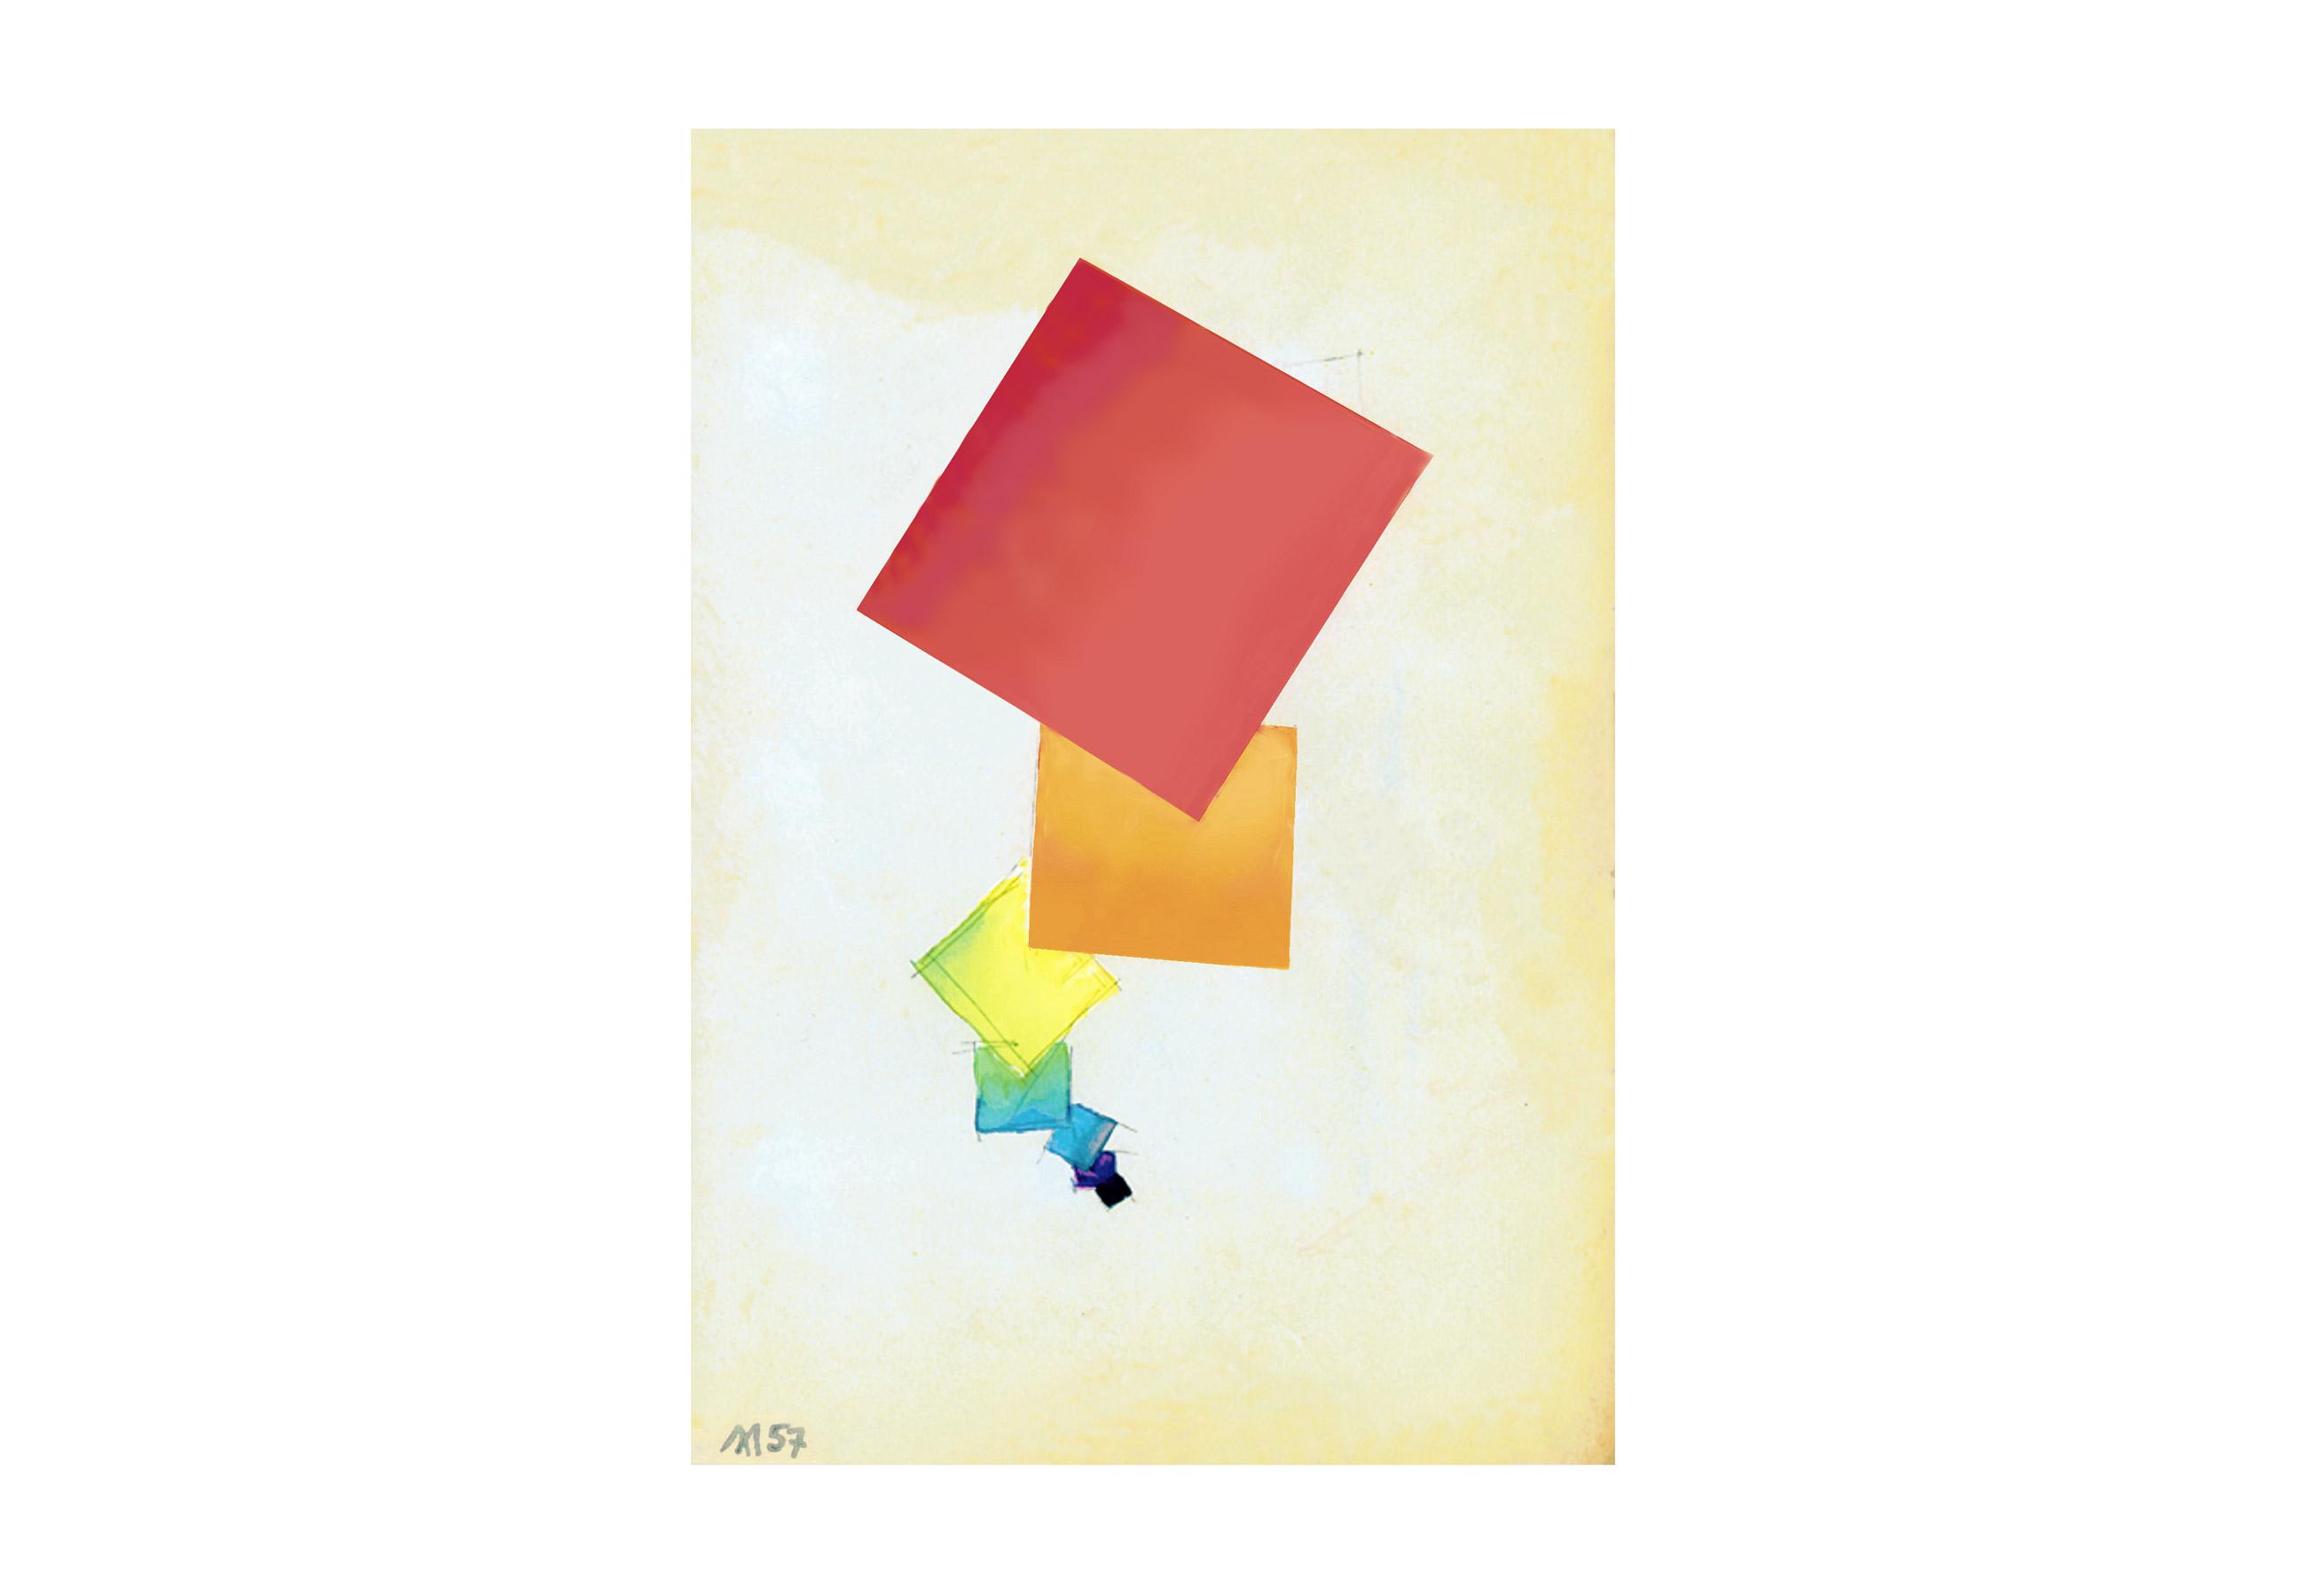 Lamm-Portfolio-1956-59-13.jpg